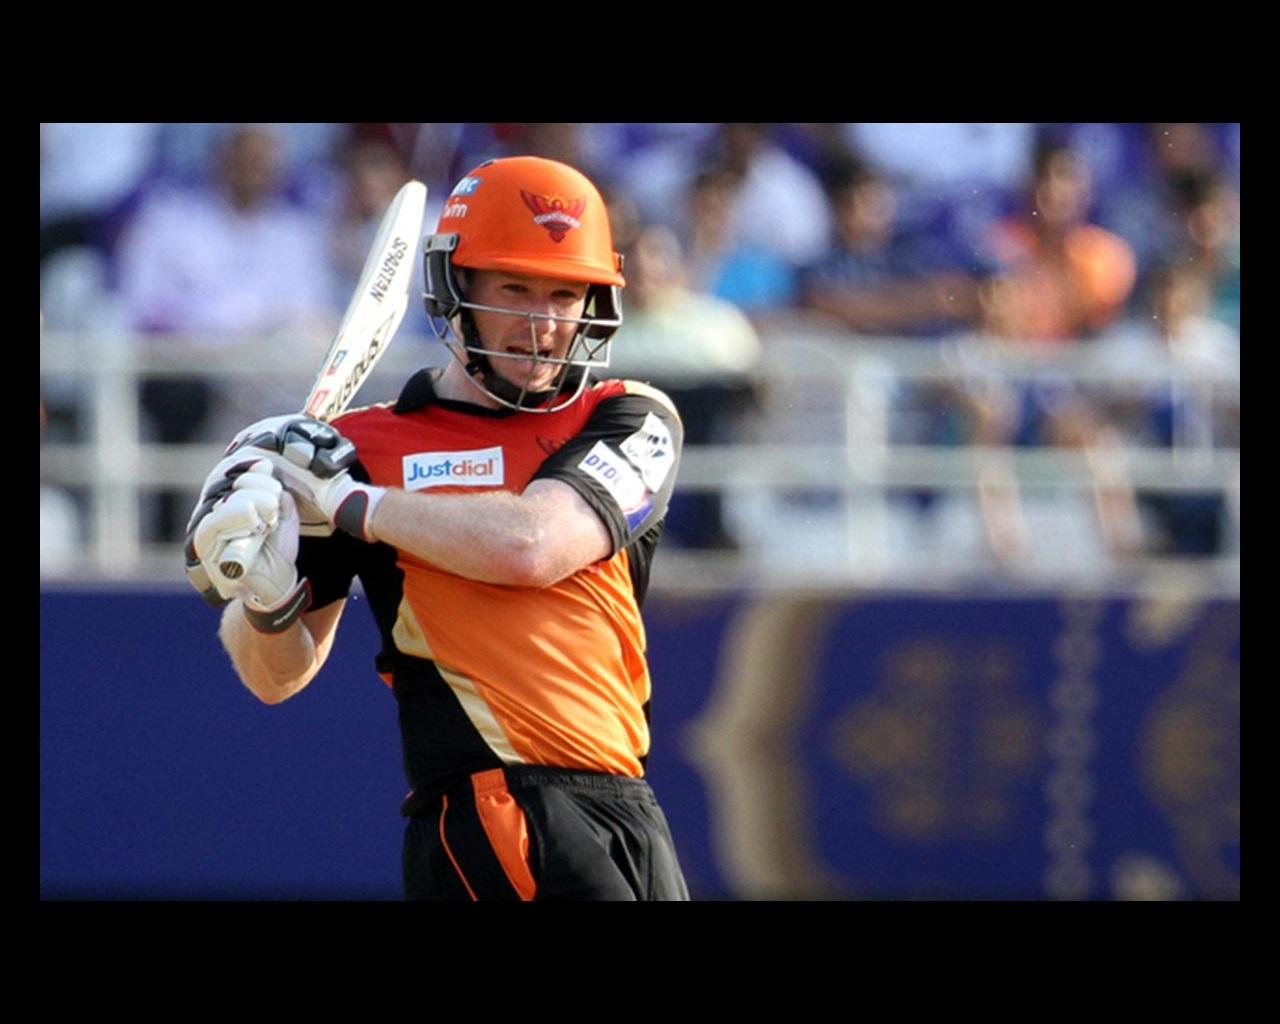 Morgan blisters Sunrisers to key win | cricket com au